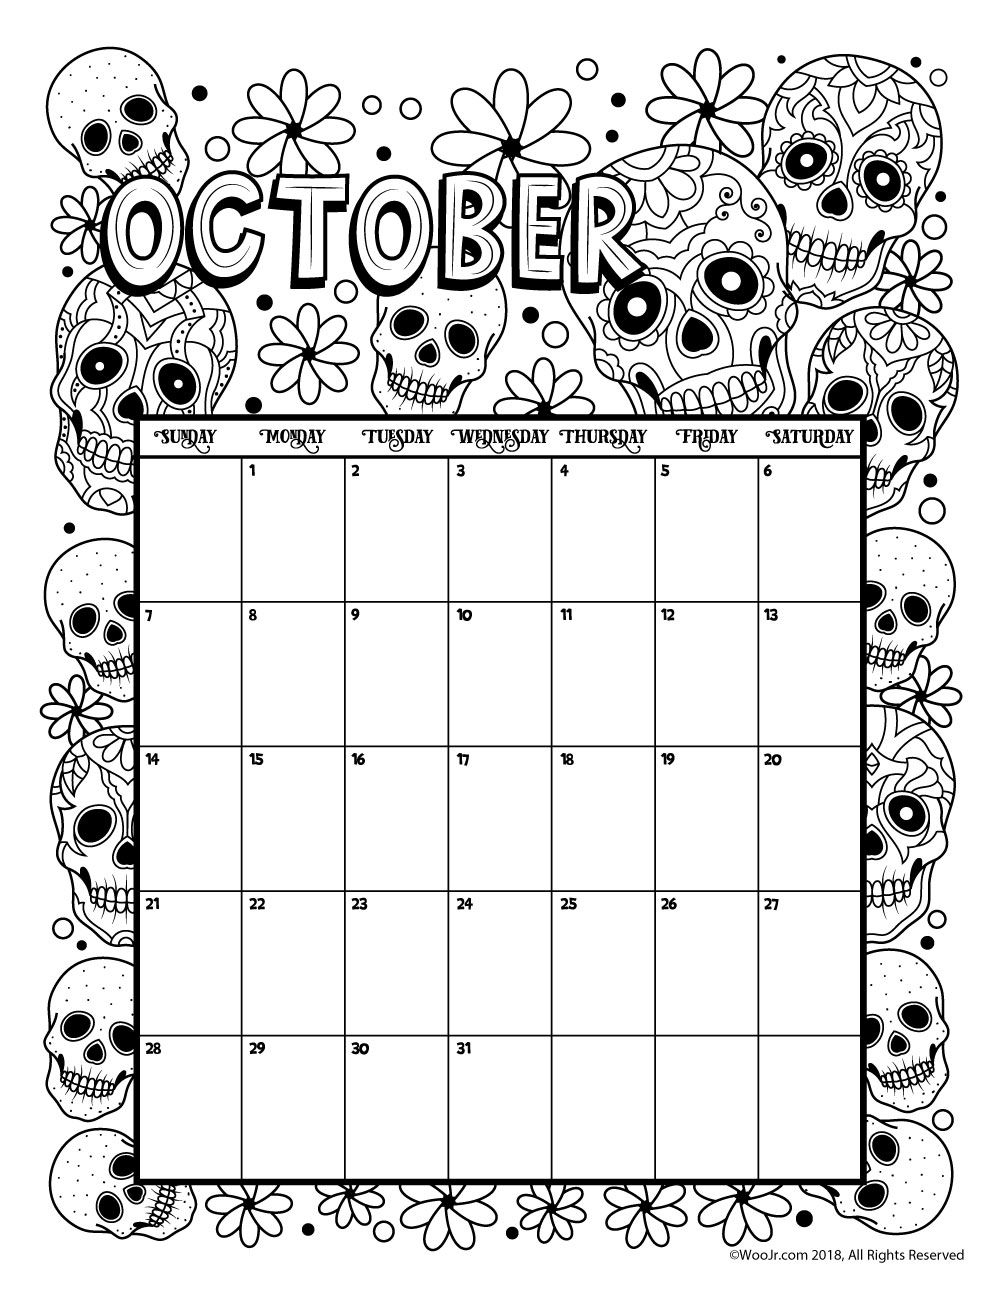 October 2018 Coloring Calendar Page | Сделай Сам | Календарь Для within Free Printable Adult October Calendar 2019 Coloring Sheets